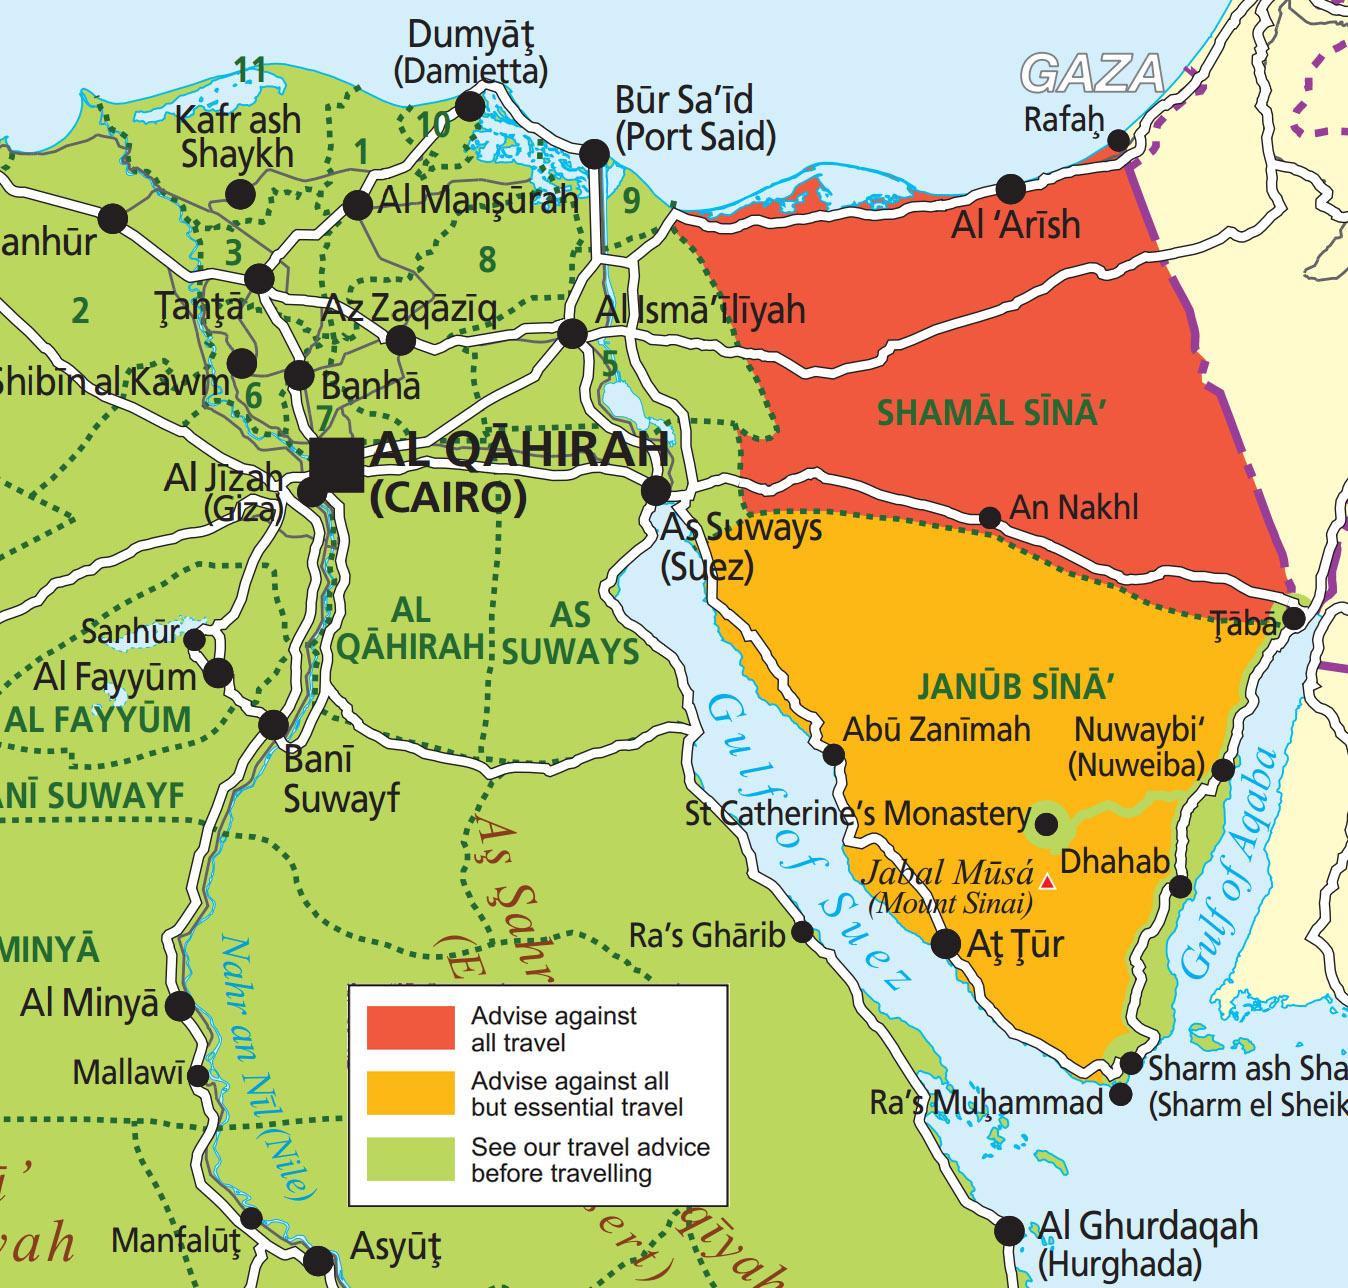 Ägypten Karte ~ Ägypten König